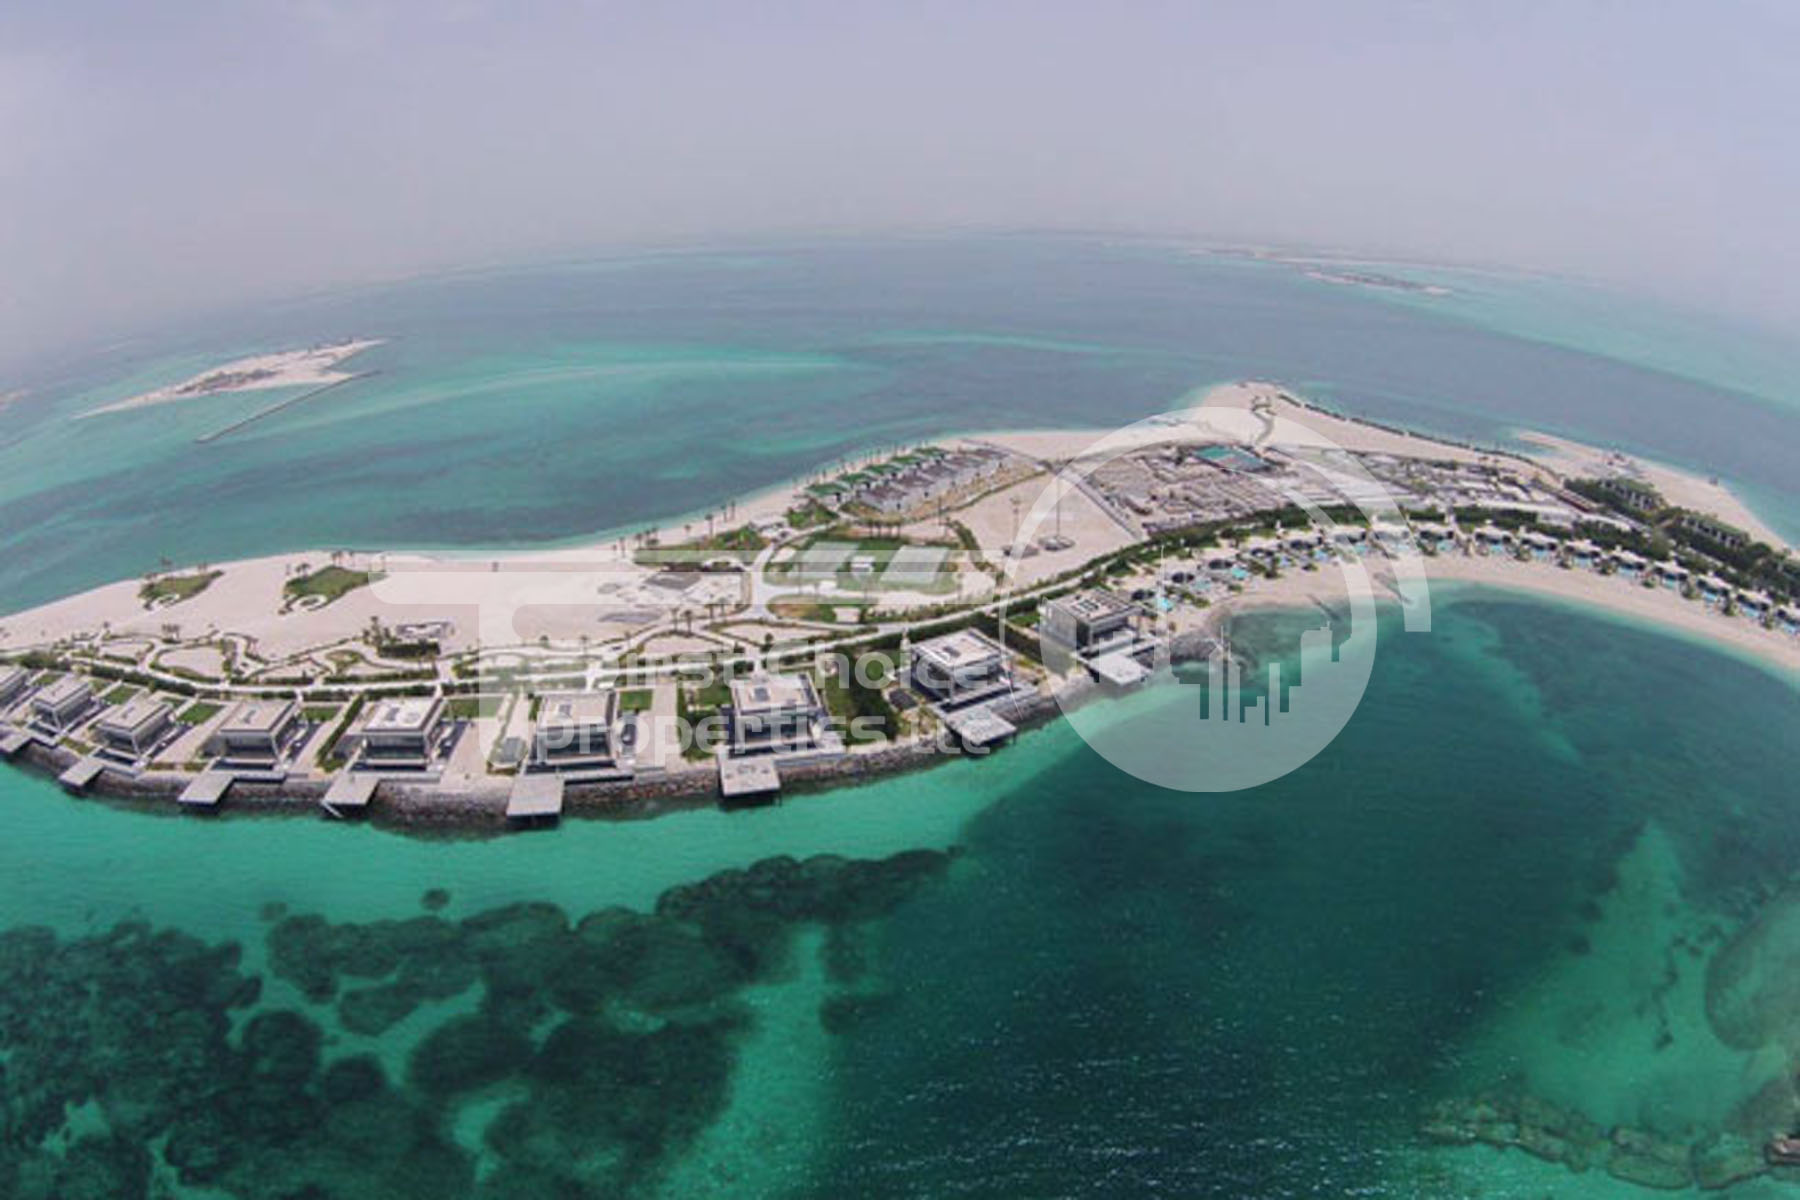 Residential Island - Nareel Island - Al Bateen - Abu Dhabi - UAE (17).jpg